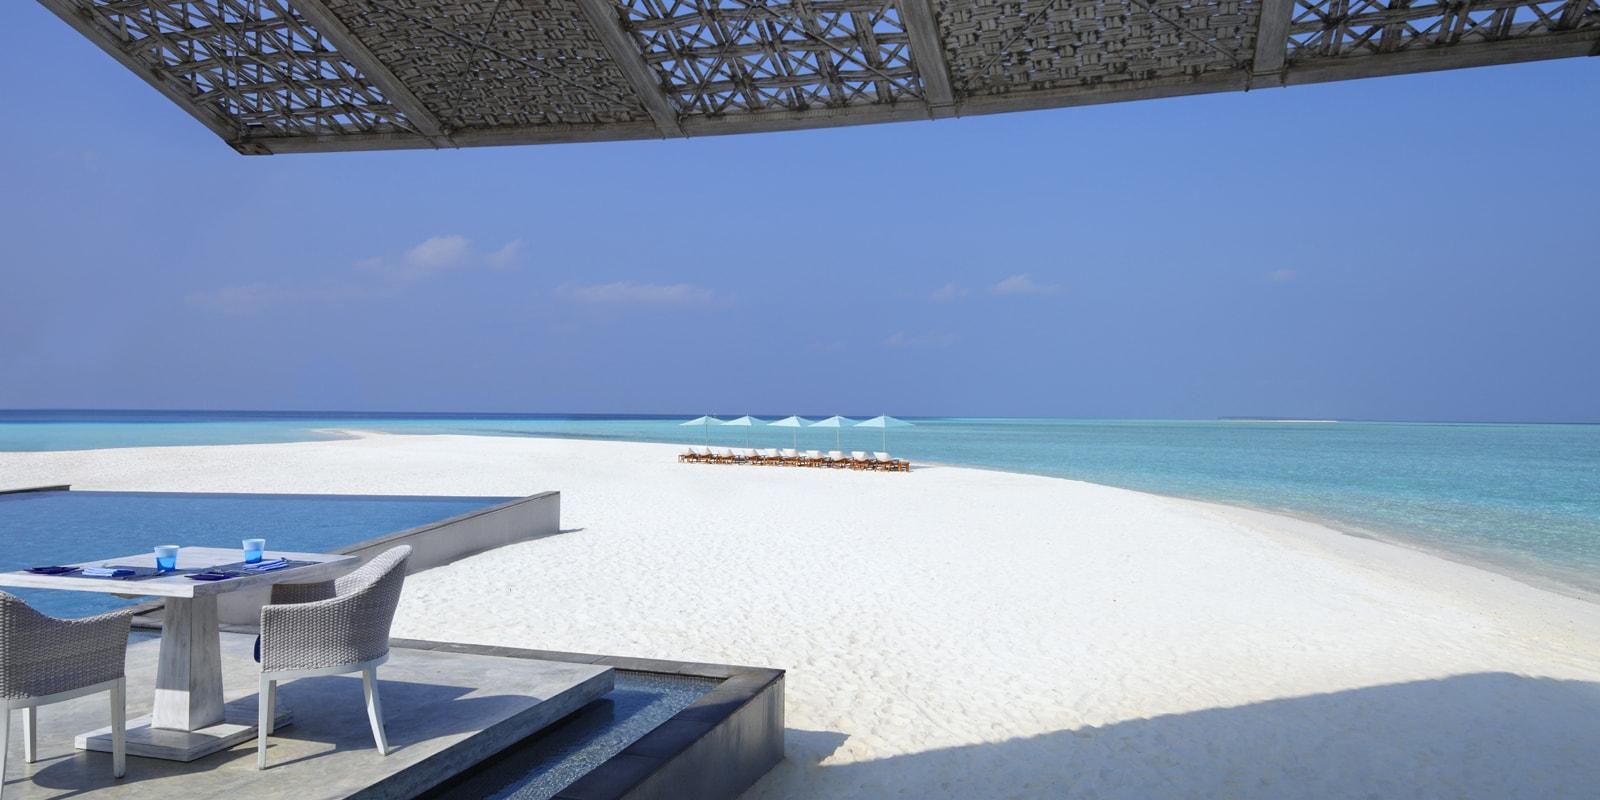 OCOA-TRAVEL-MALDIVES-FS2